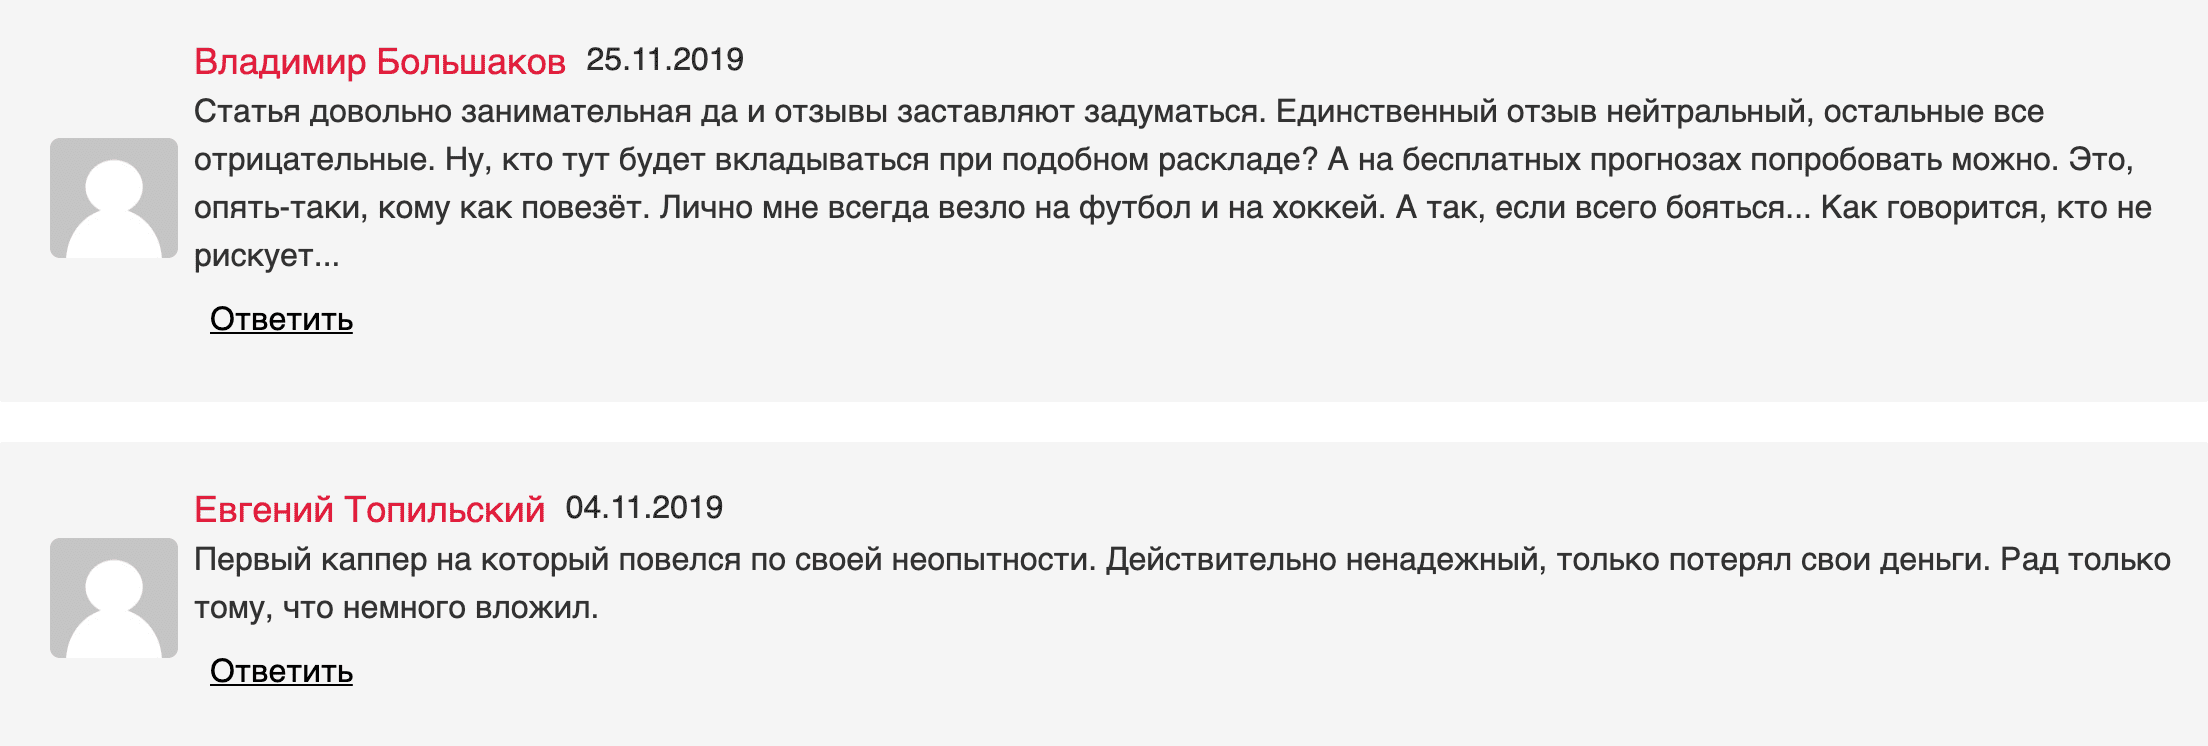 Отзывы о телеграм канале Марата Булатова